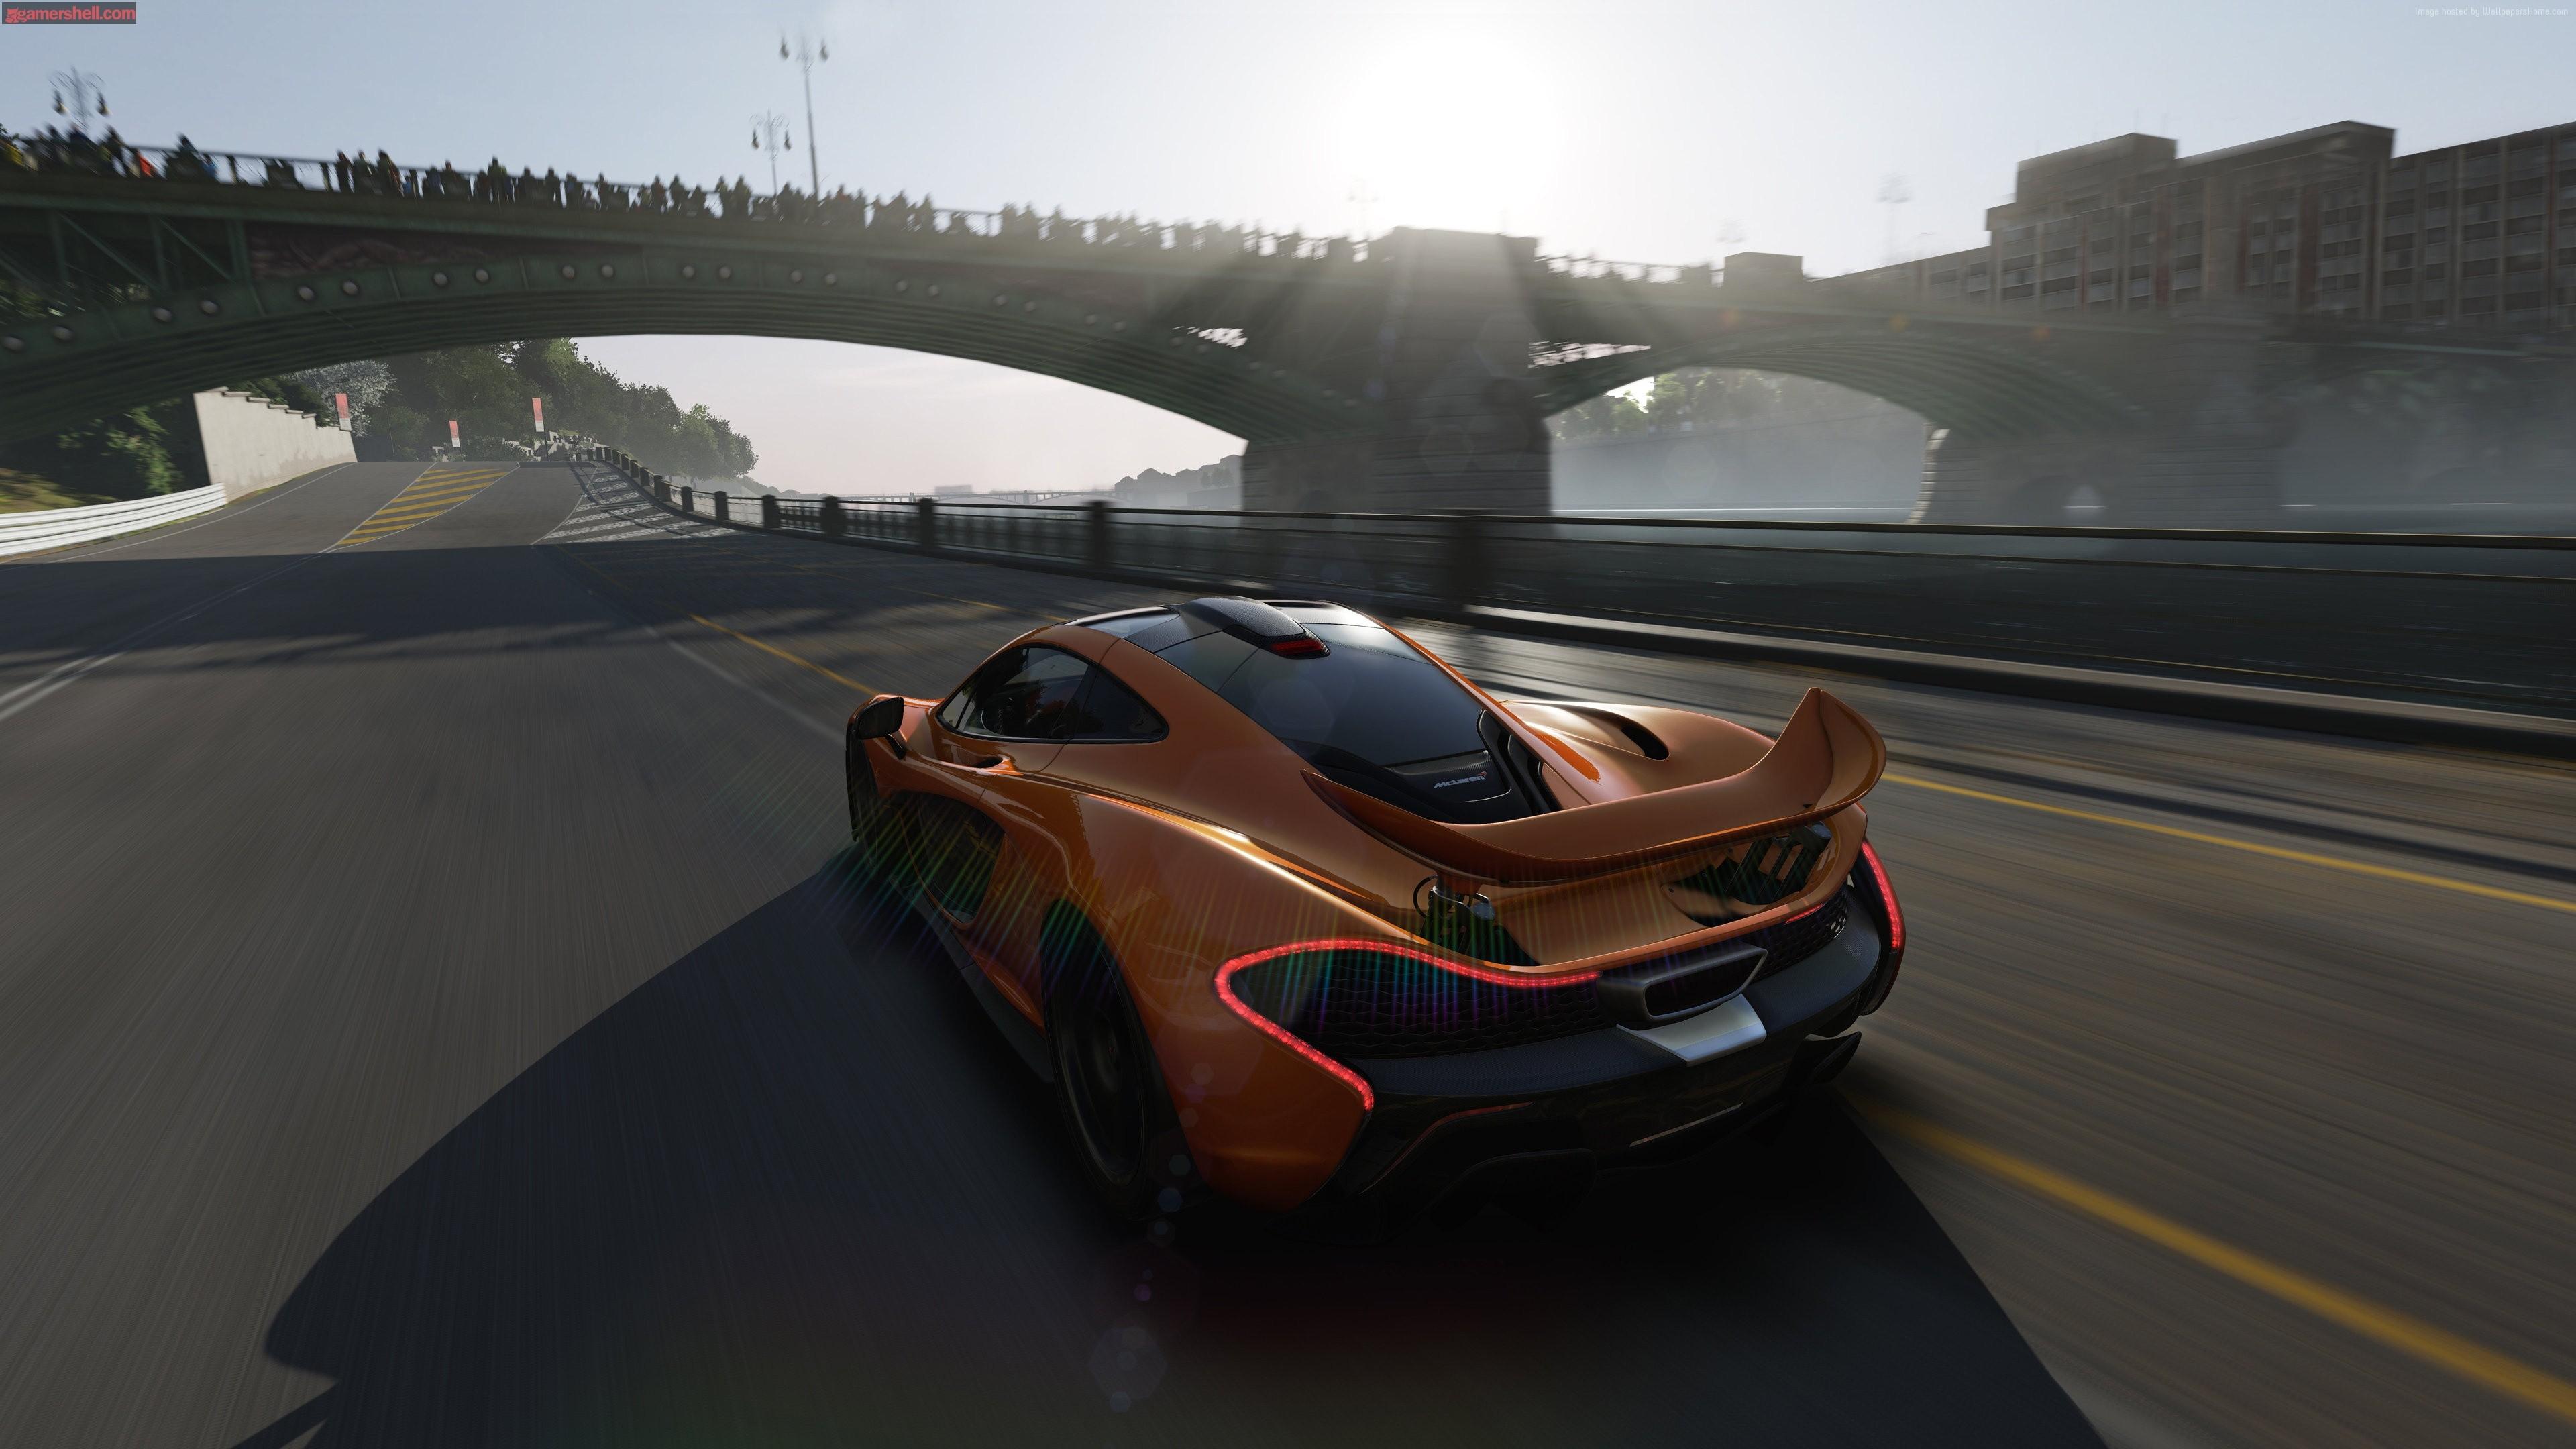 Forza Motorsport 6 Wallpaper Games Simulation Forza Motorsport 6 3840x2160